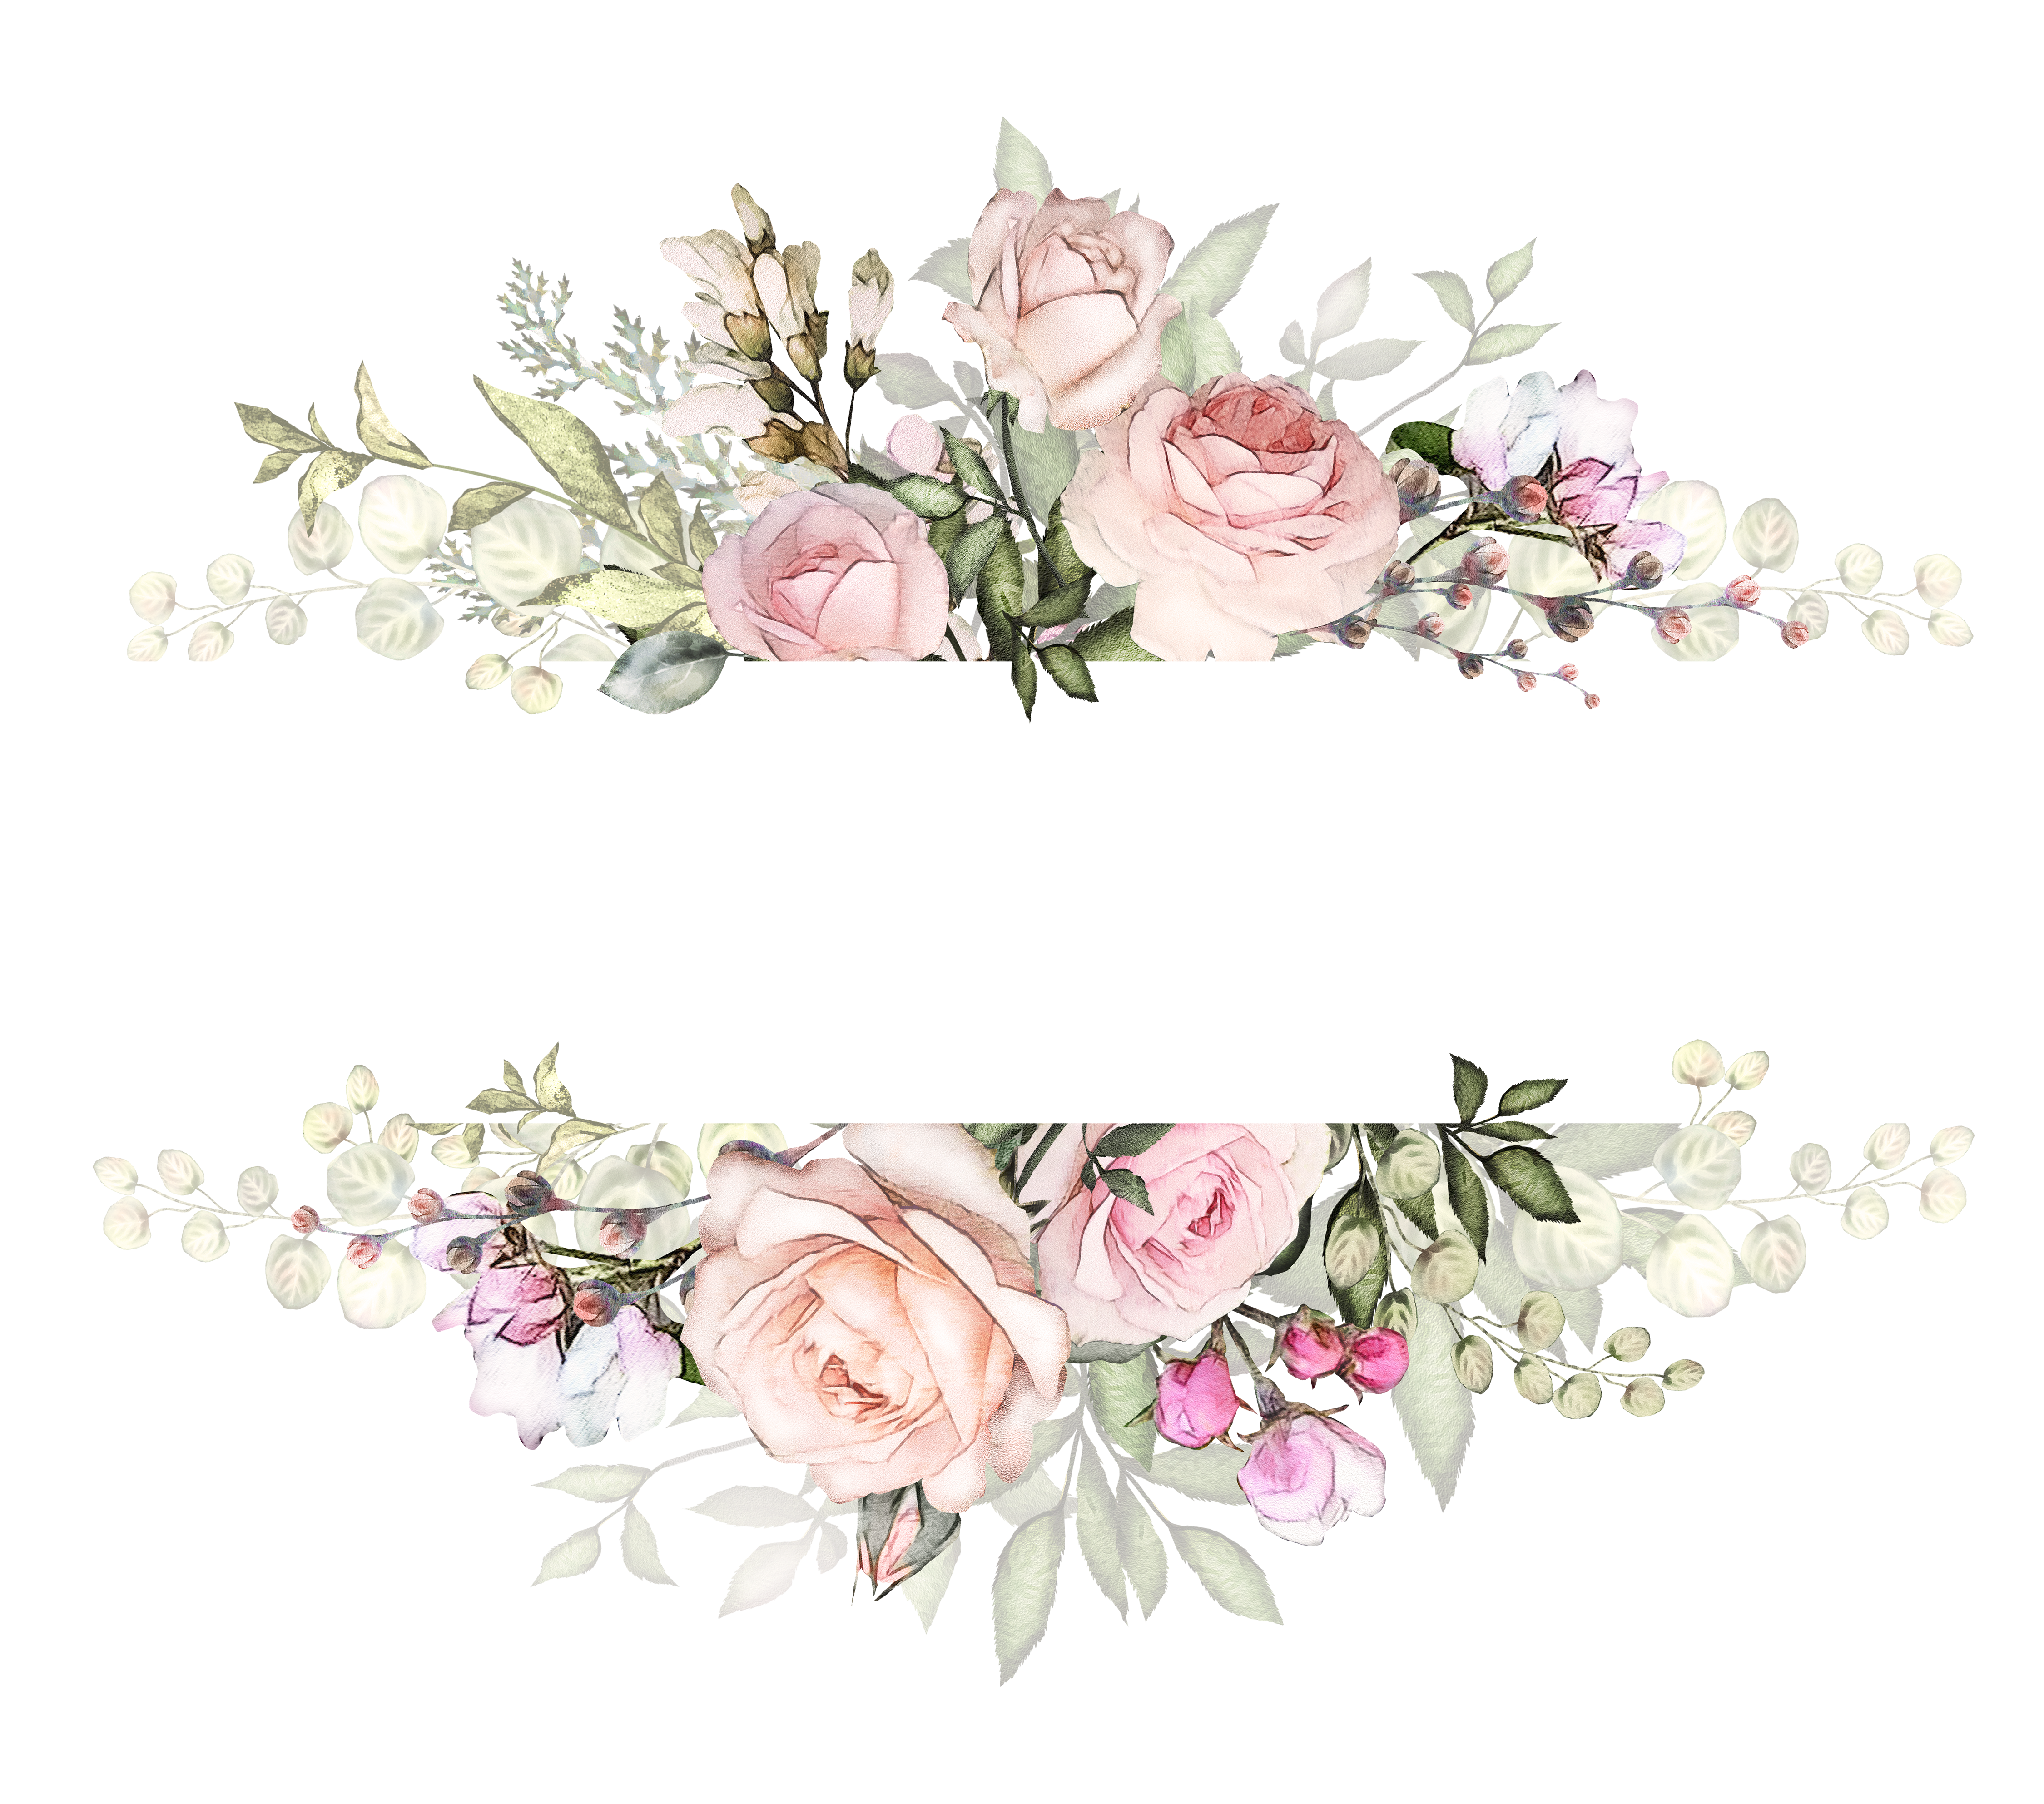 Fundaluri vintage Ilustrações florais, Imagem floral